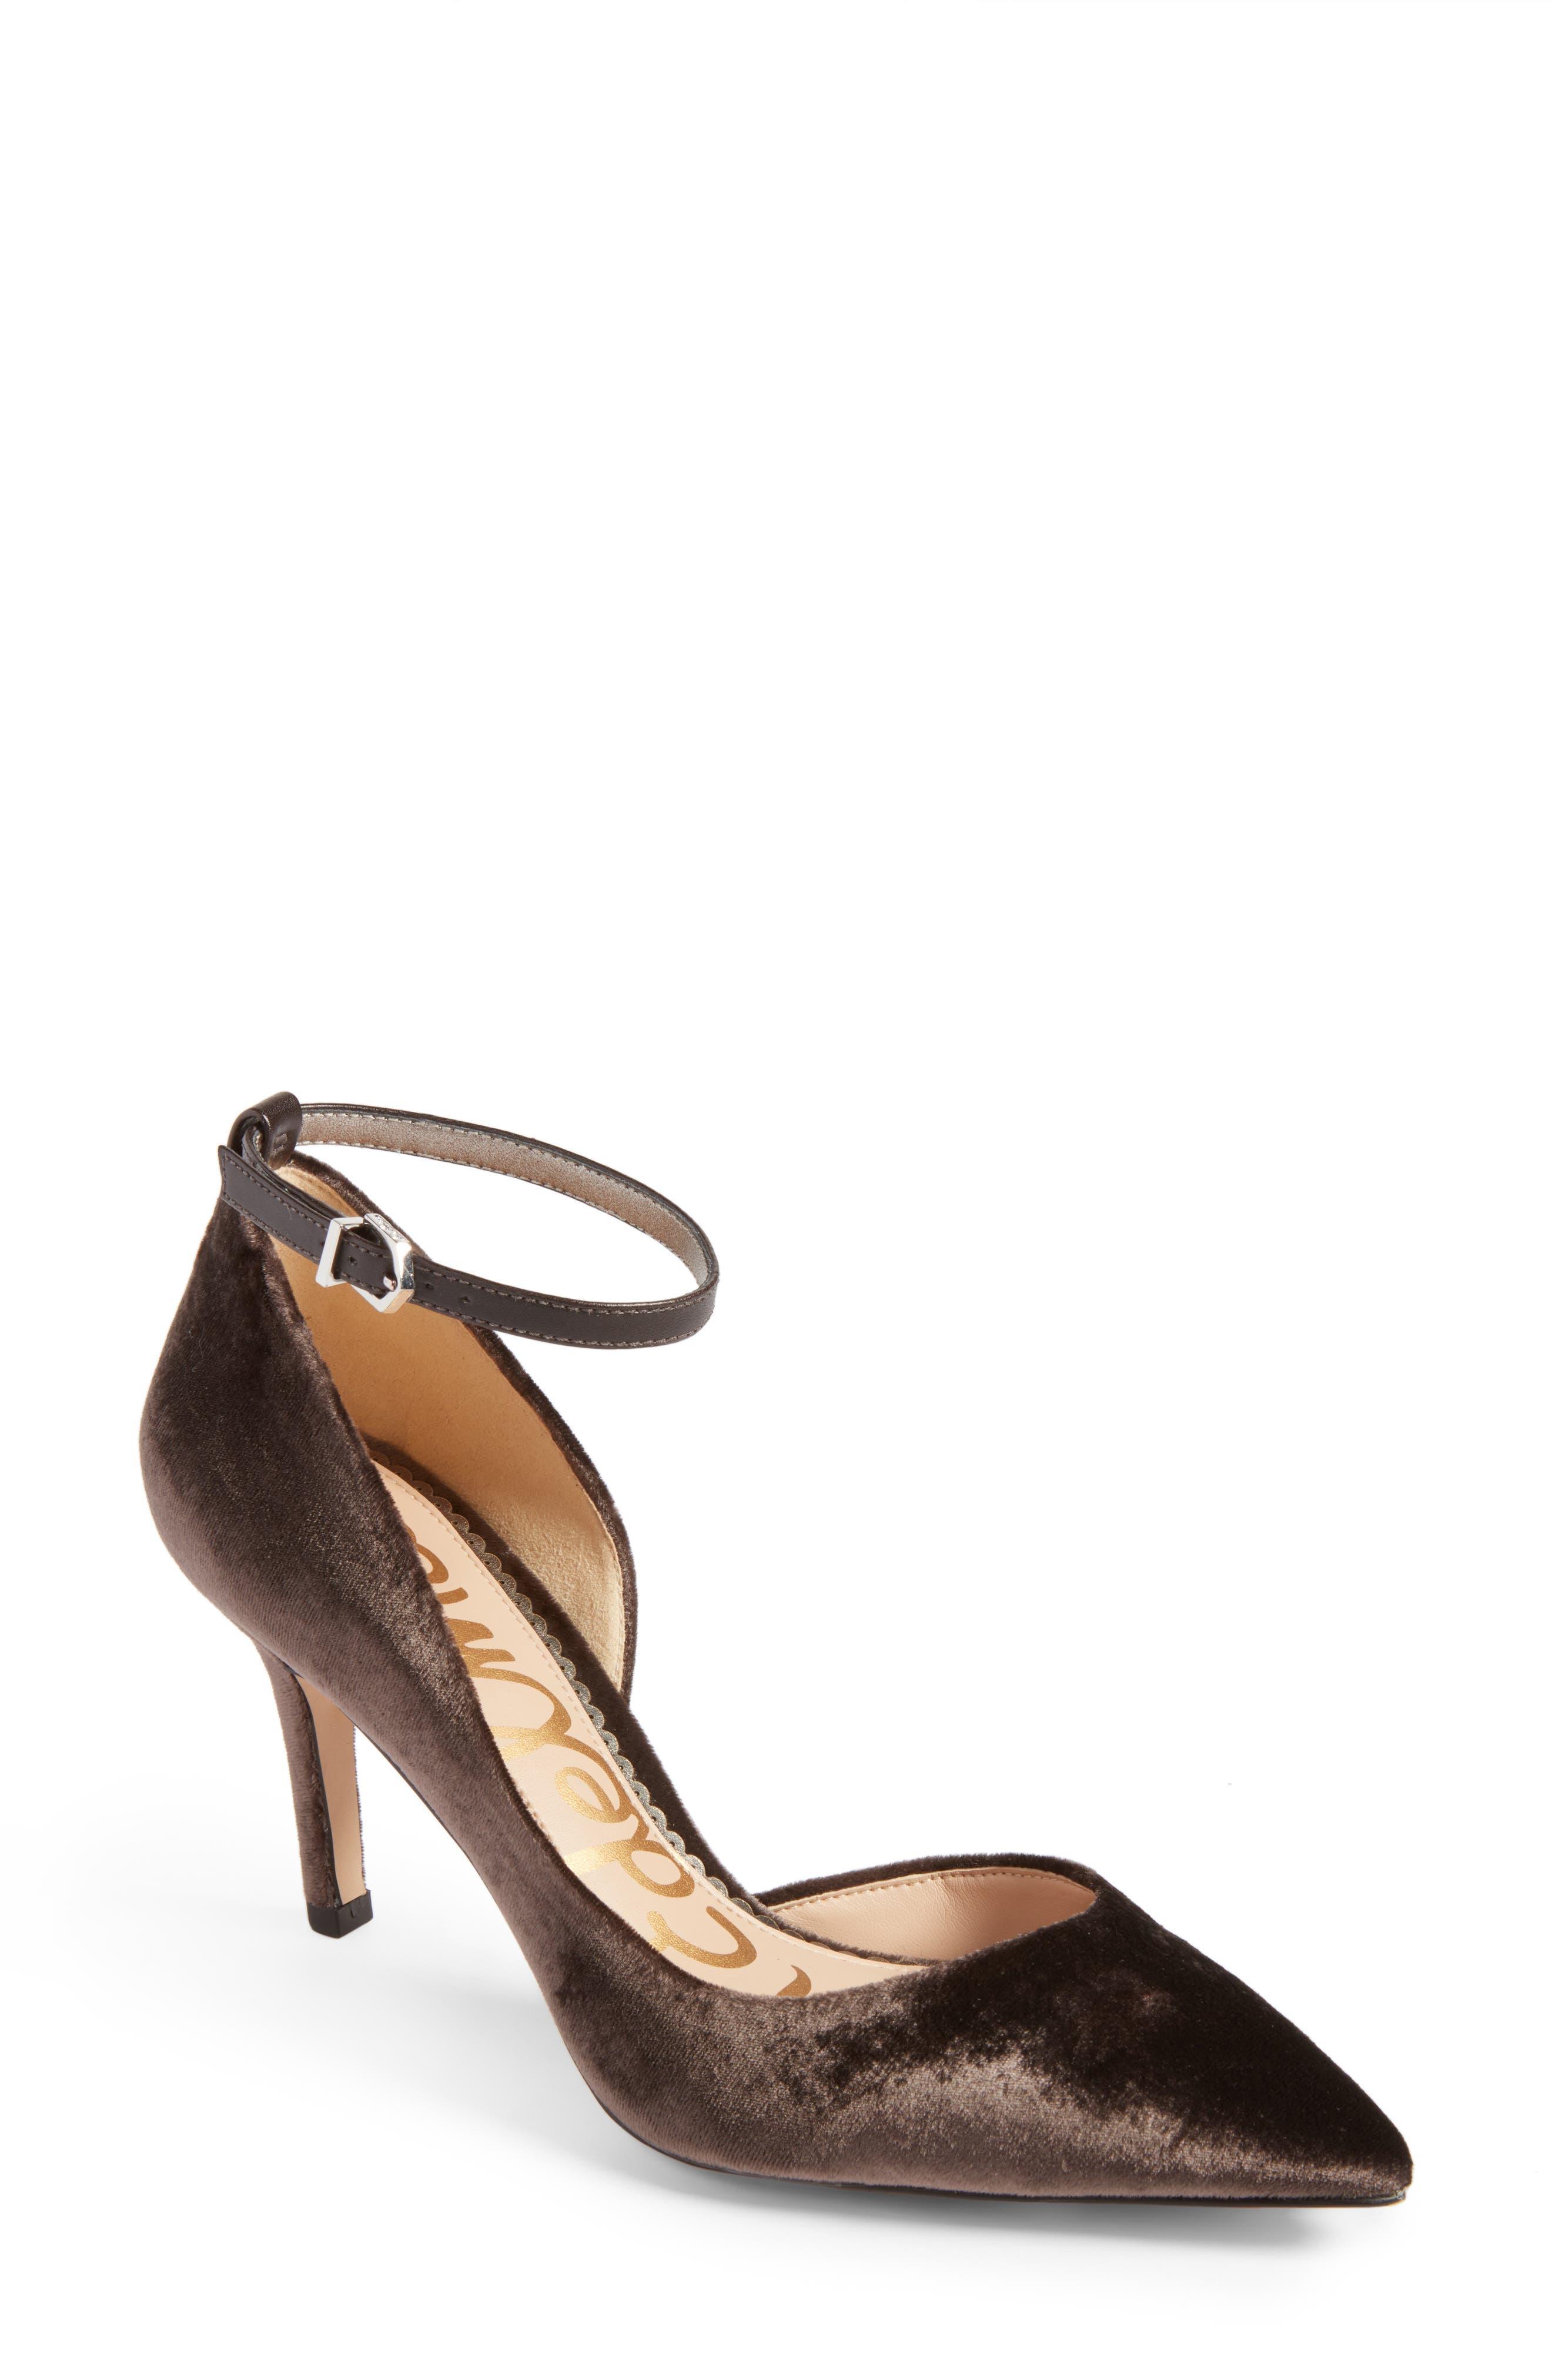 Alternate Image 1 Selected - Sam Edelman Tia Ankle Strap Pump (Women)